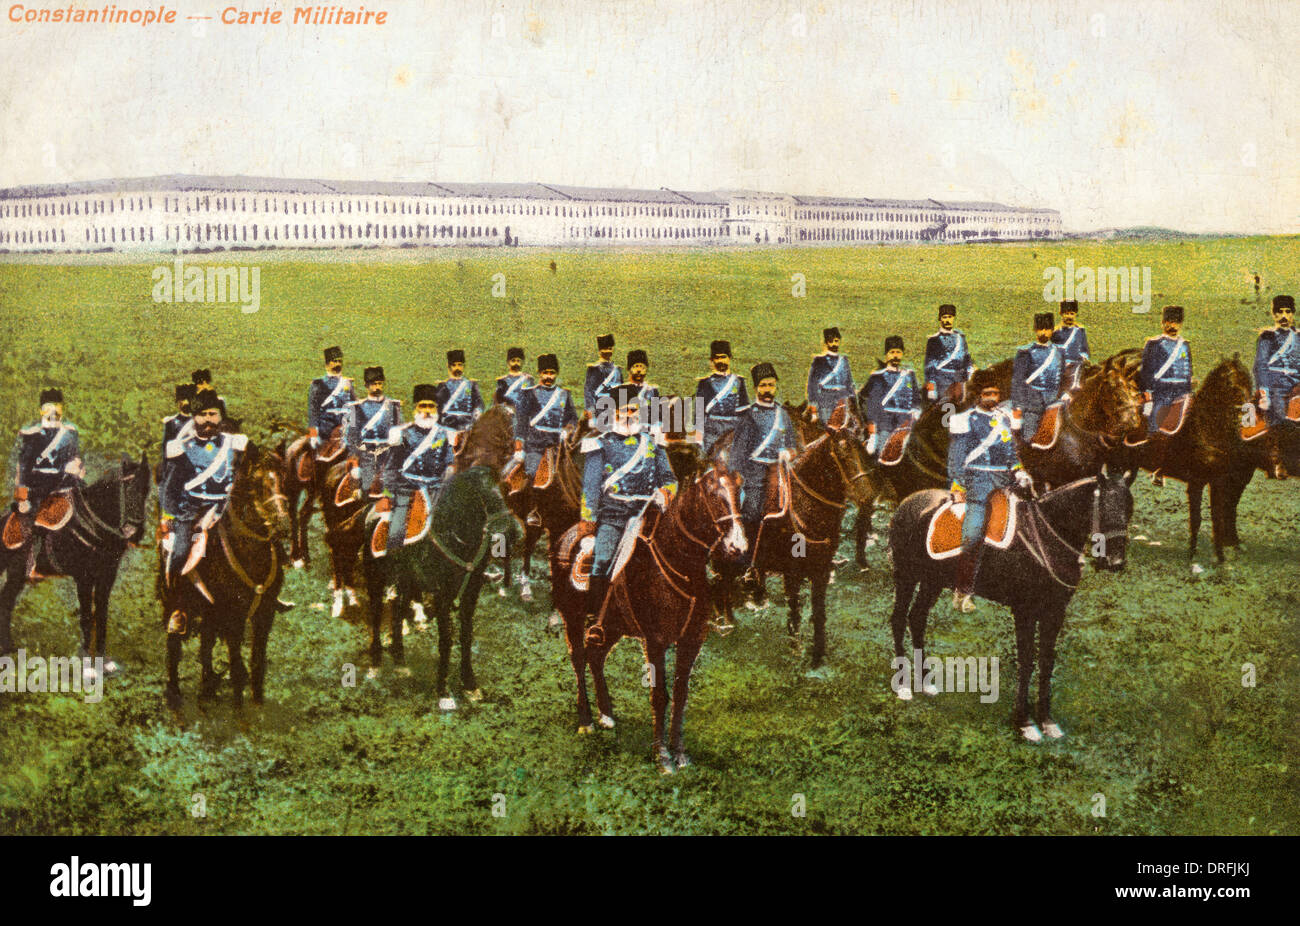 Regiment of Lancers - Constantinople - Stock Image